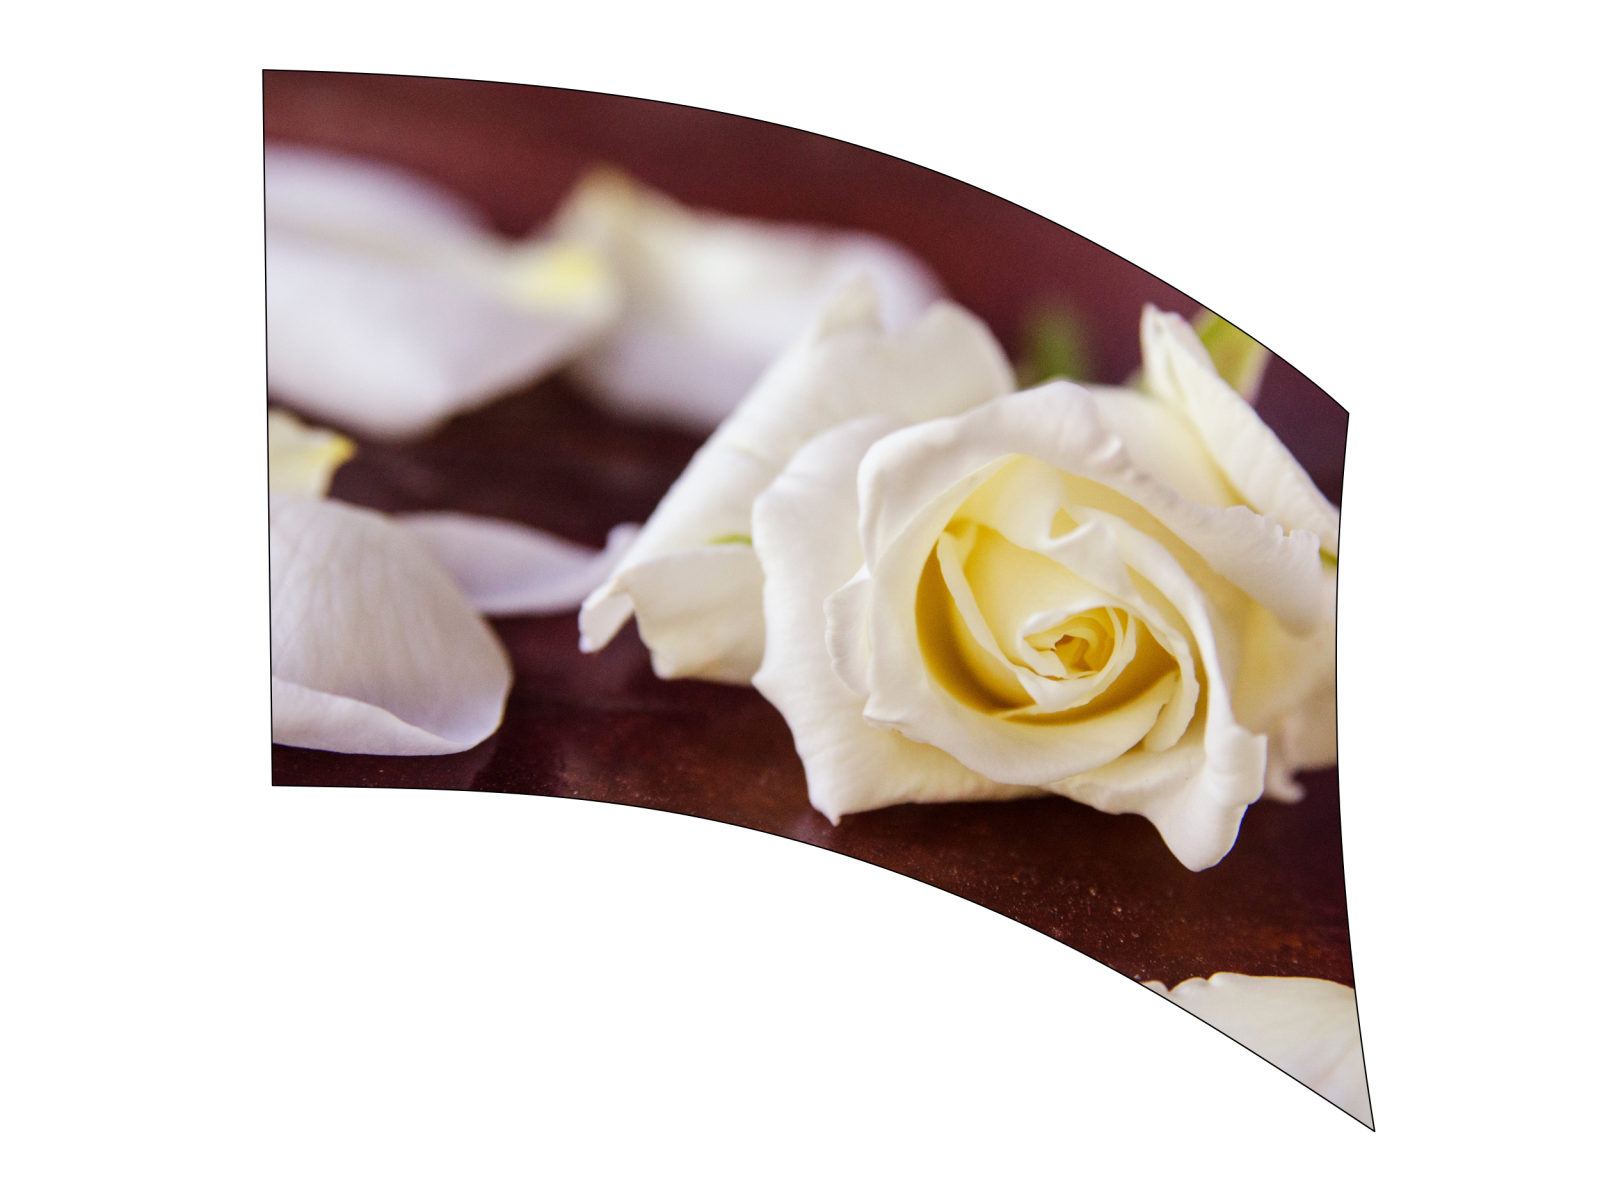 070210s - 36x52 Standard Cream Rose